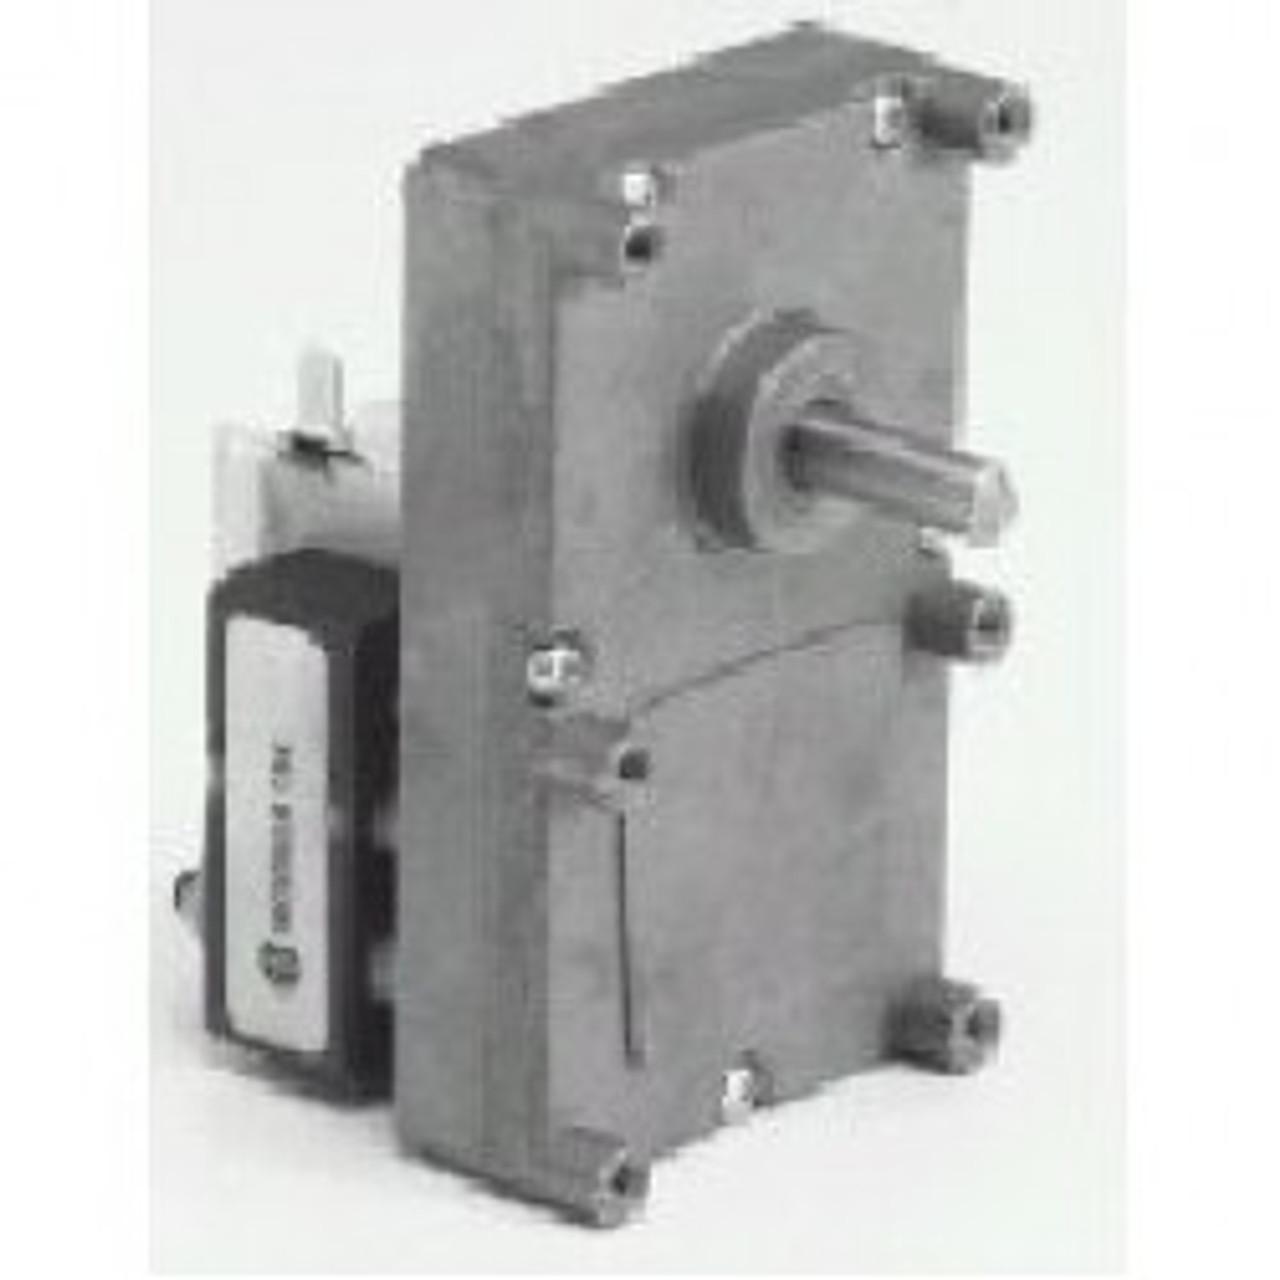 E-R7-RGM651 (open box) (HM-RGM651)Whitfield Quest 5.5 RPM, 1/2 in. shaft, Aug